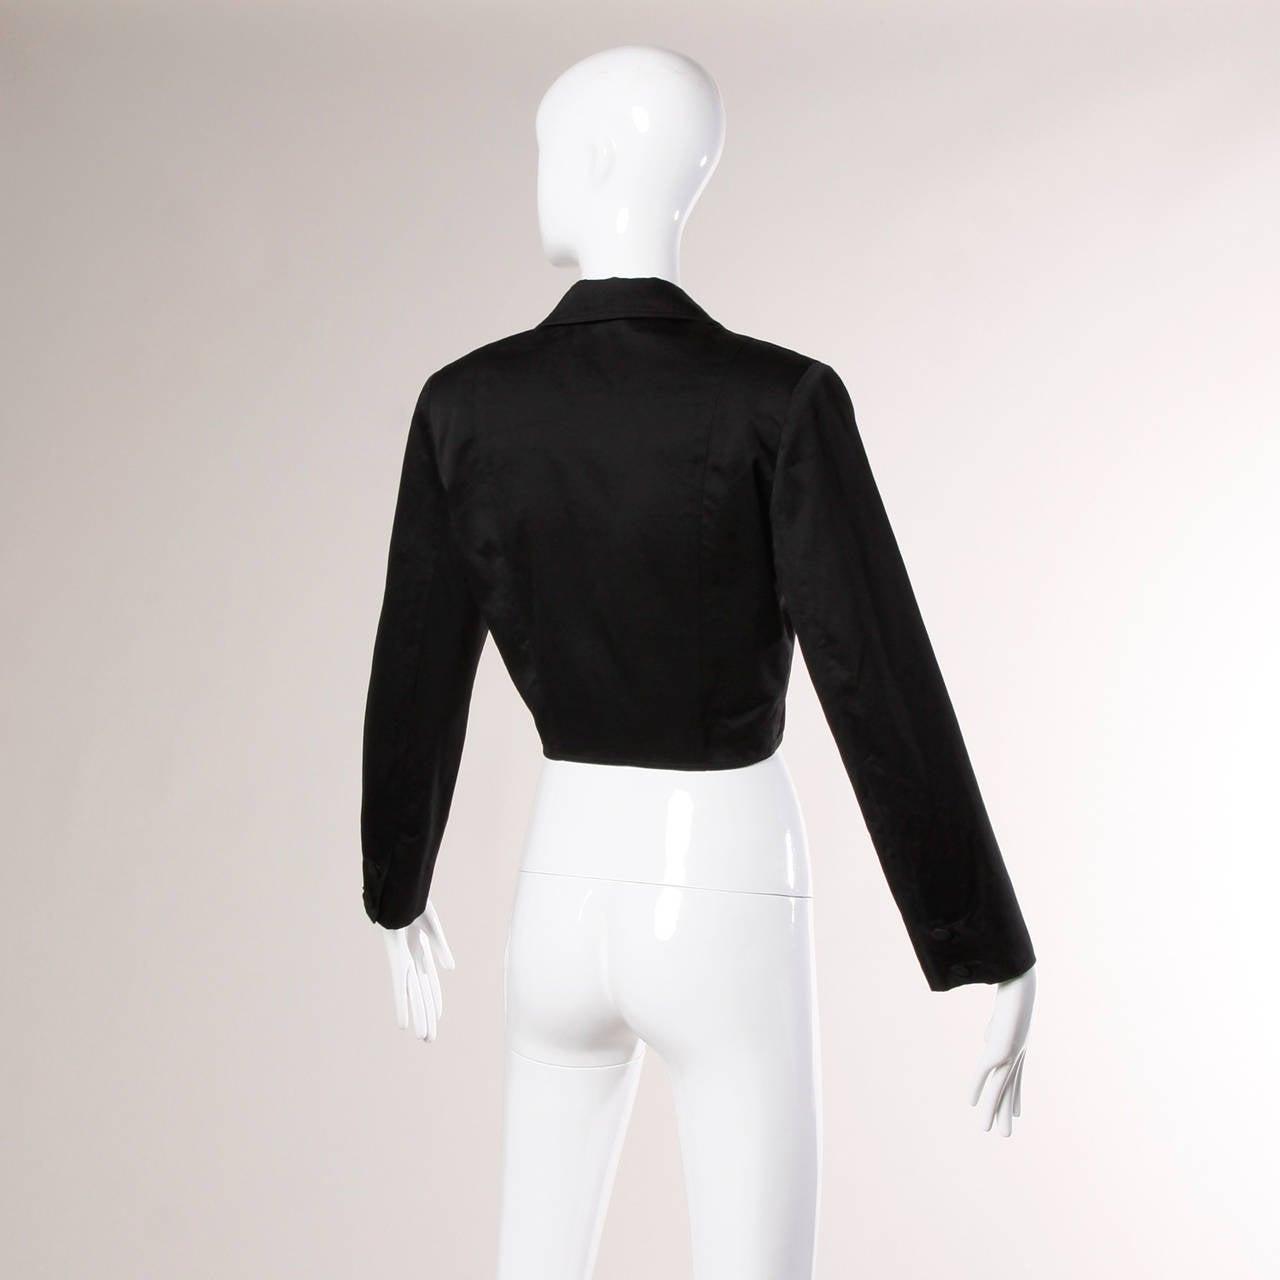 Patrick Kelly Vintage Black Lace Up Grommet Jacket 5